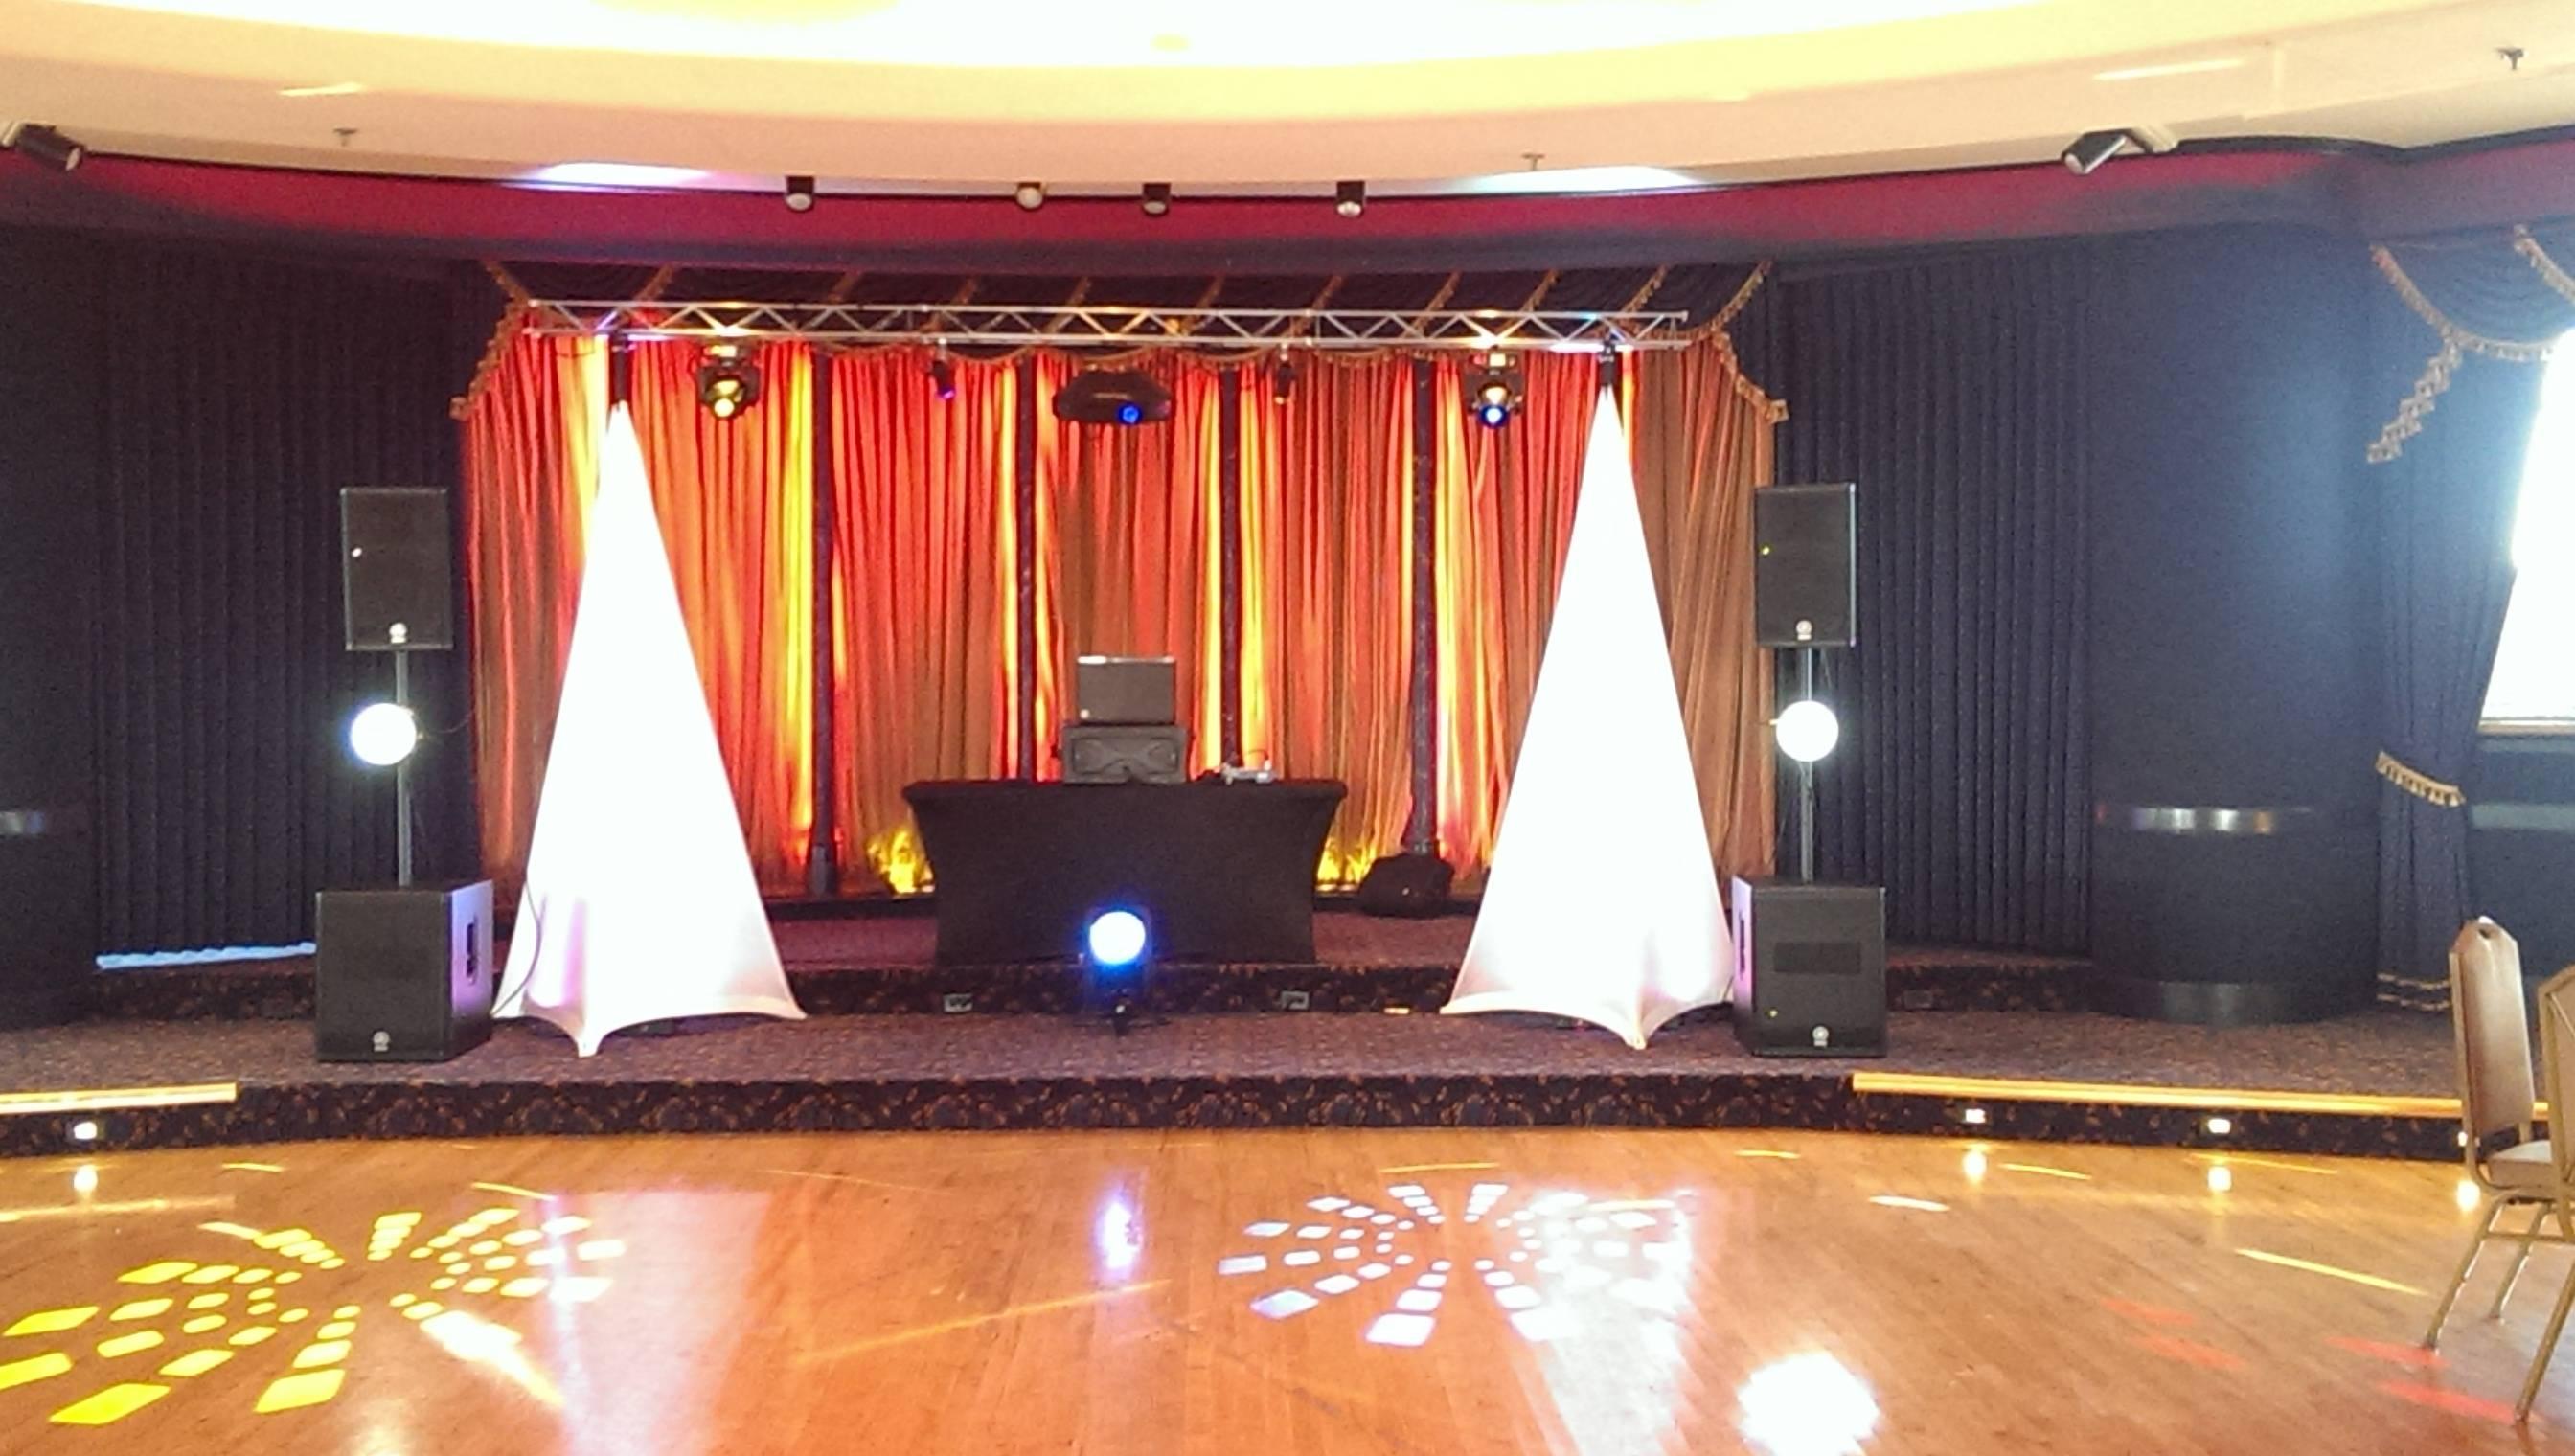 The Peabody - Skyway Ballroom - Memphis, TN